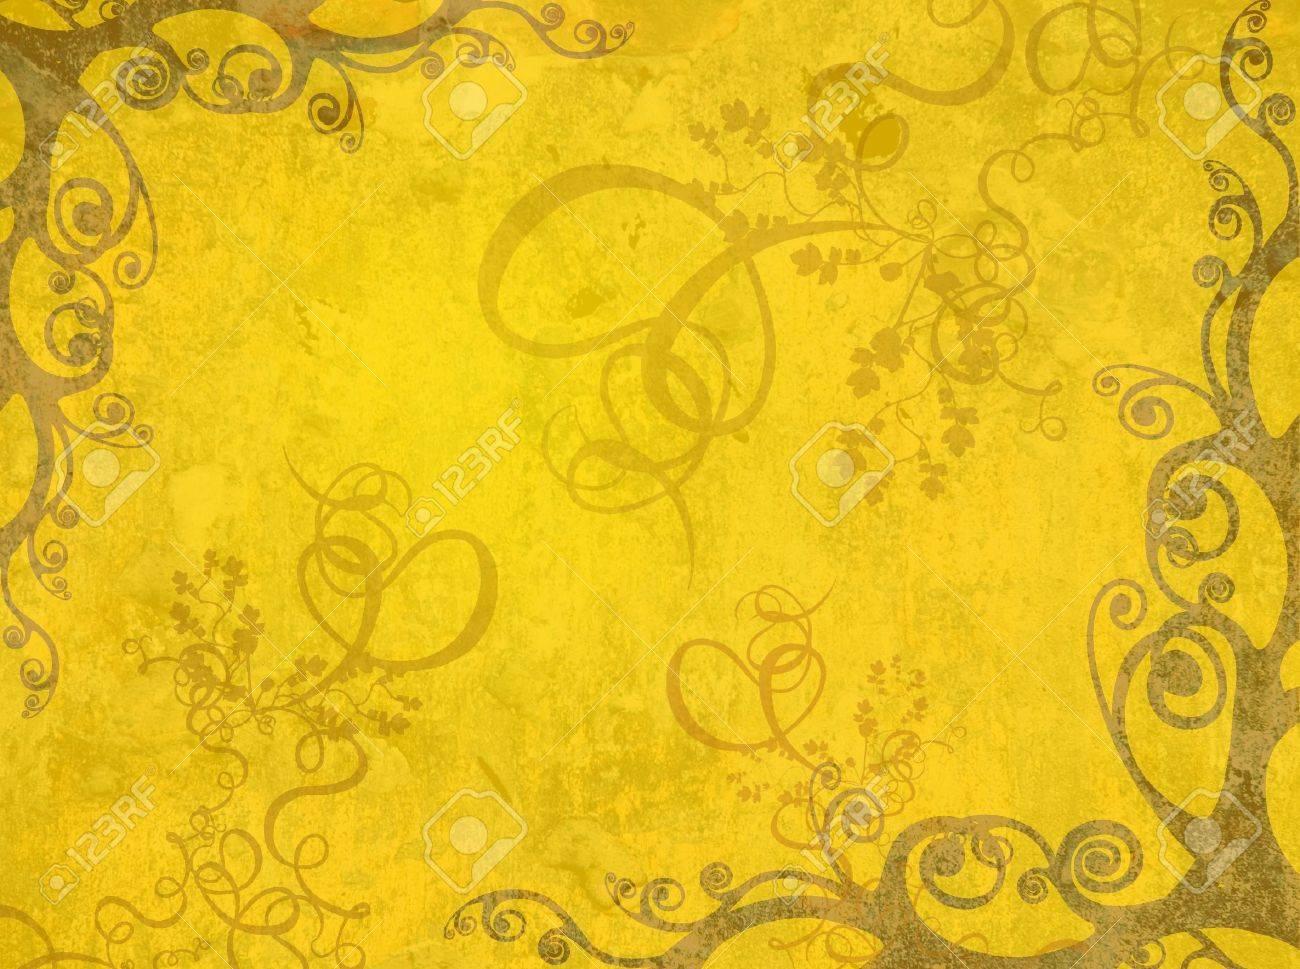 yellow artistic frame Stock Photo - 353850